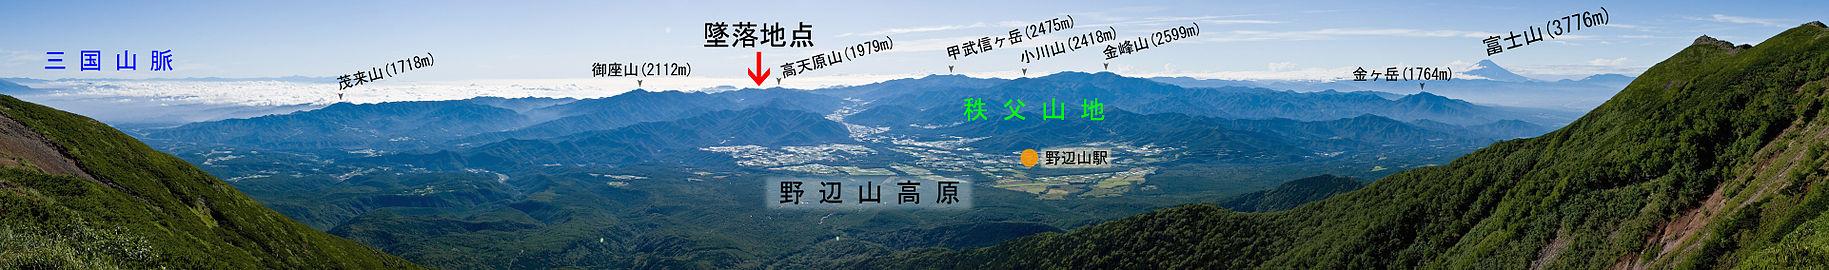 Okuchichibu Mountains from Mt.Yokodake 01 4 일본항공 JAL123편 추락사고의 진실! 생존 승무원의 증언